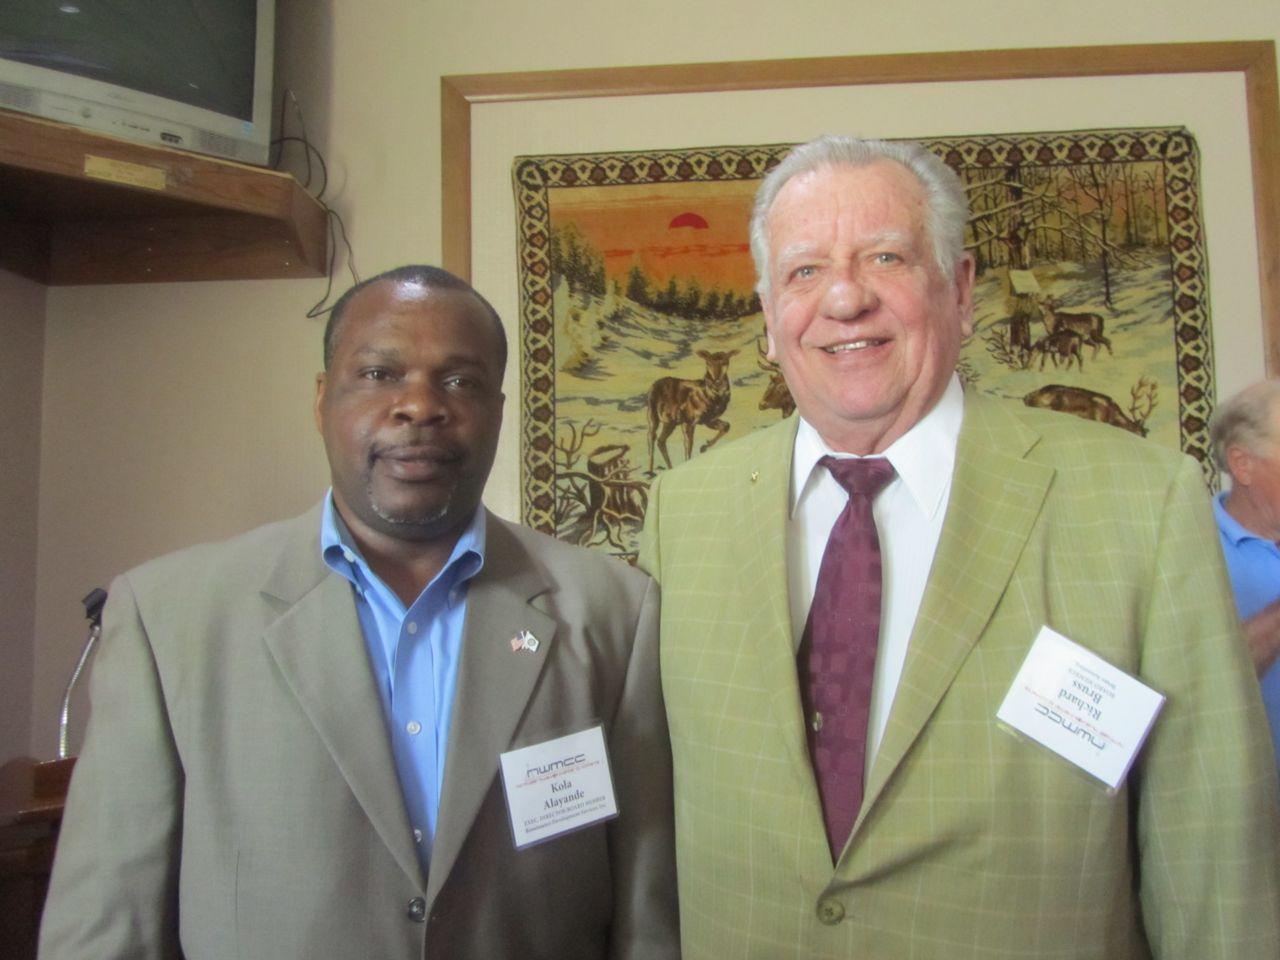 Richard Bruss and Kola Alayande at Northwest Milwaukee Chamber of Commerce Business Luncheon